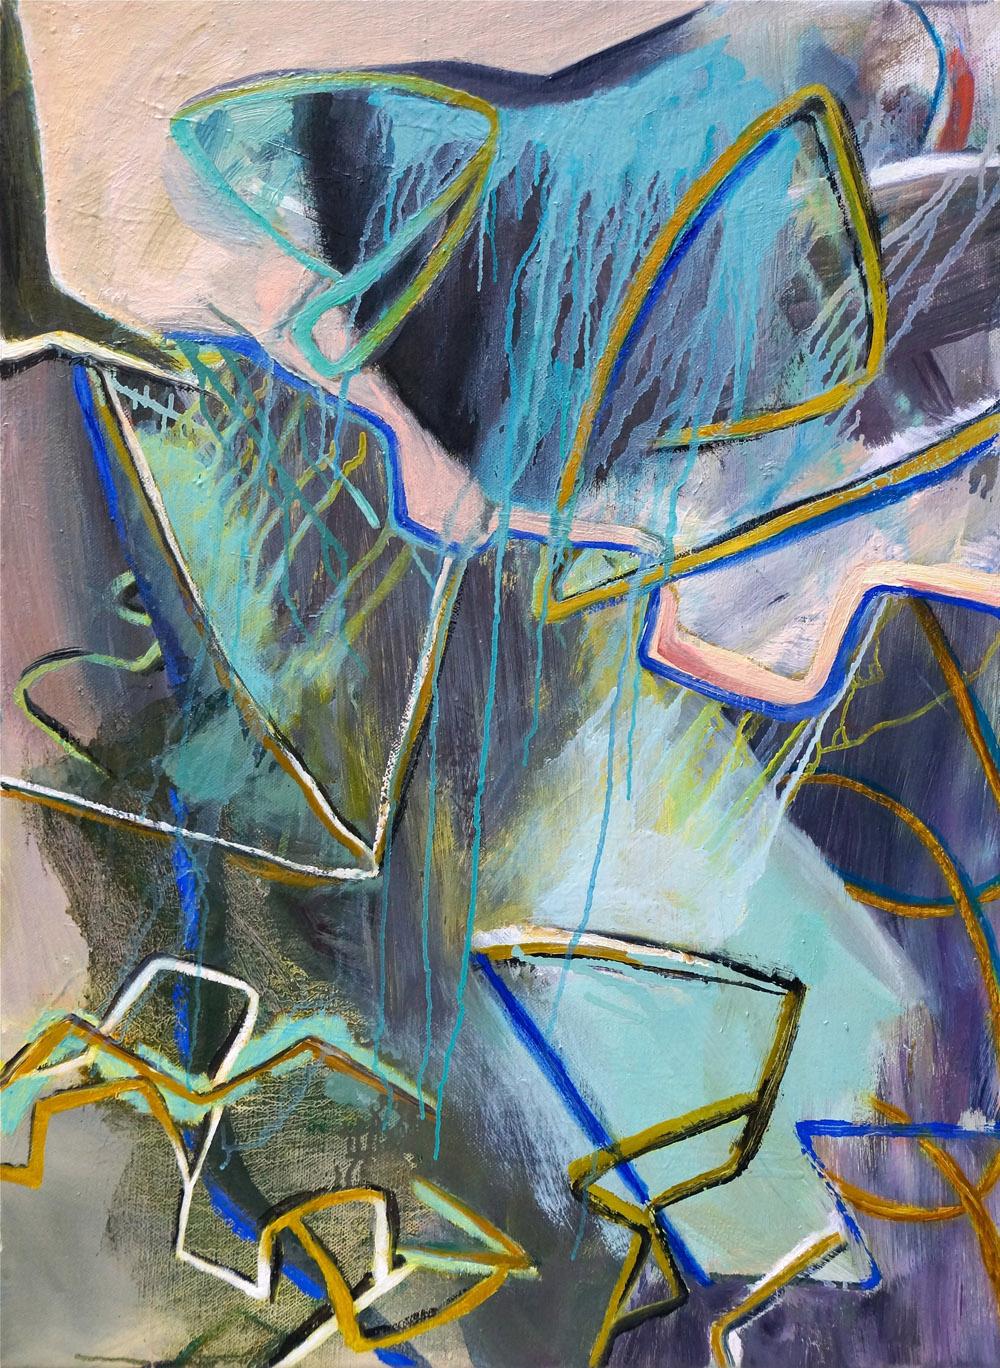 DAVID PALLISER  Aft  2015 oil on canvas 78 × 56 cm